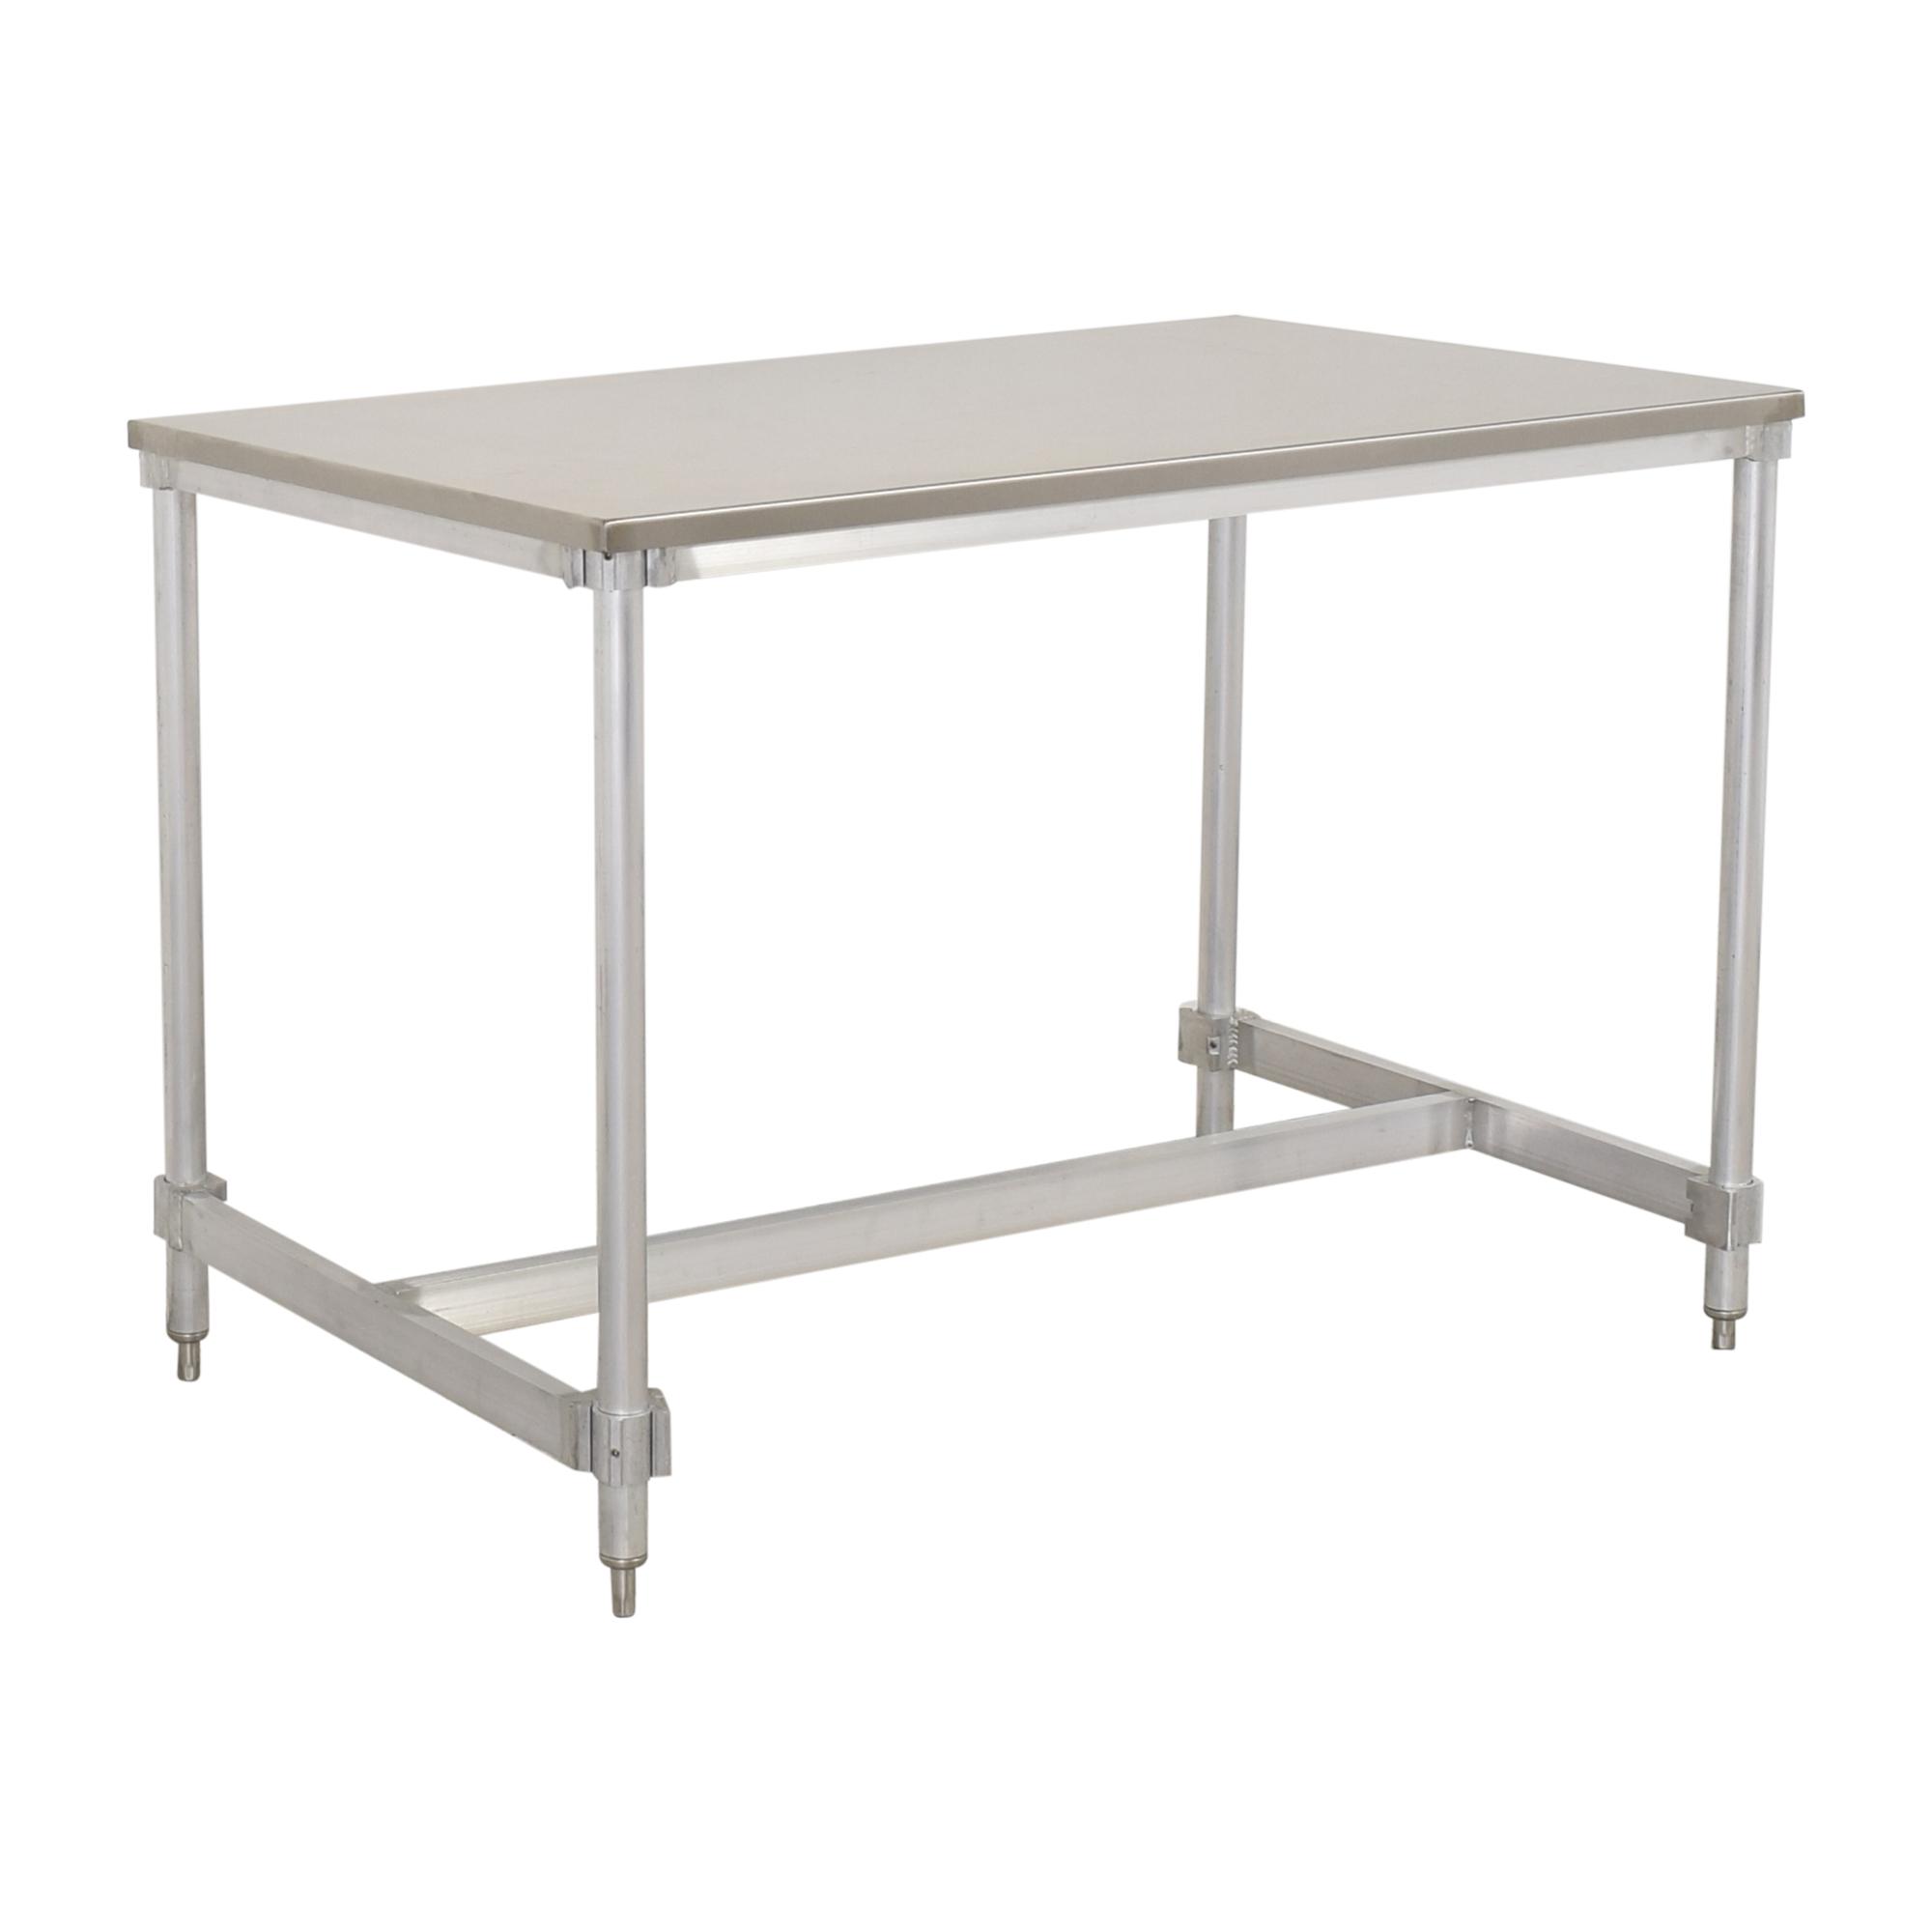 buy Prairie View Industries I-Frame Table Prairie View Industries Tables